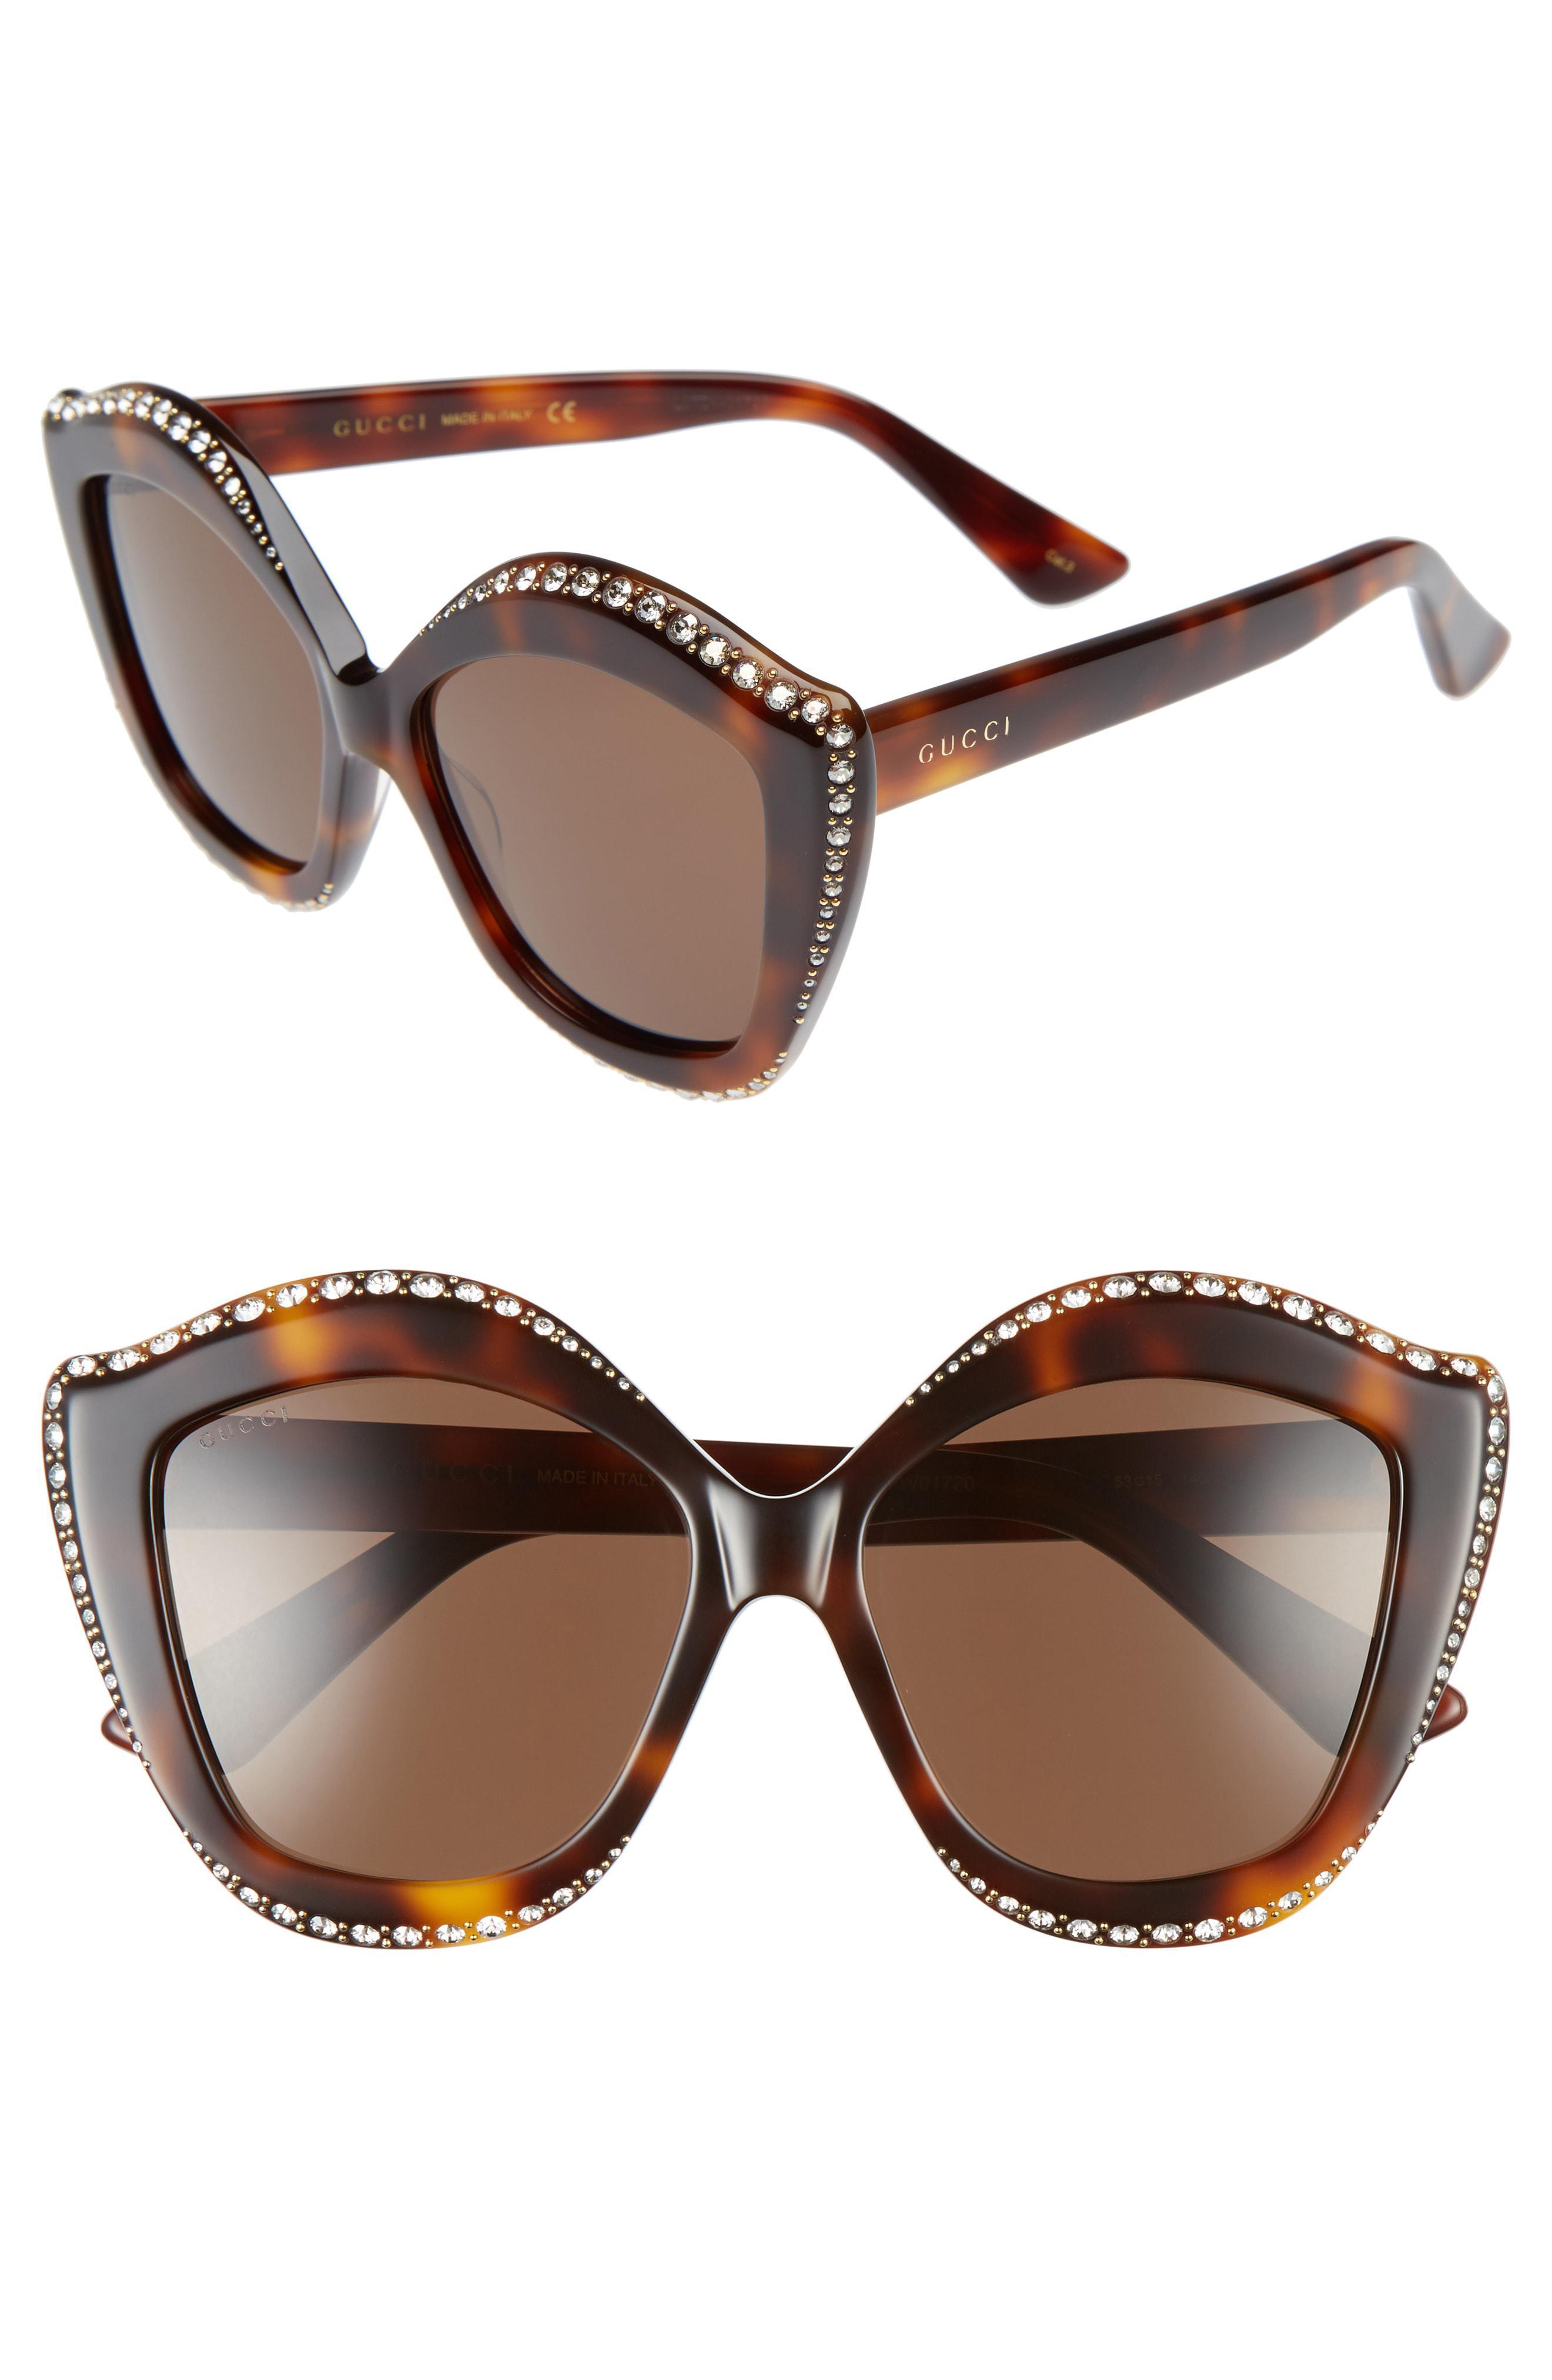 d1cd582691 Lyst - Gucci 52mm Cat Eye Sunglasses - in Brown